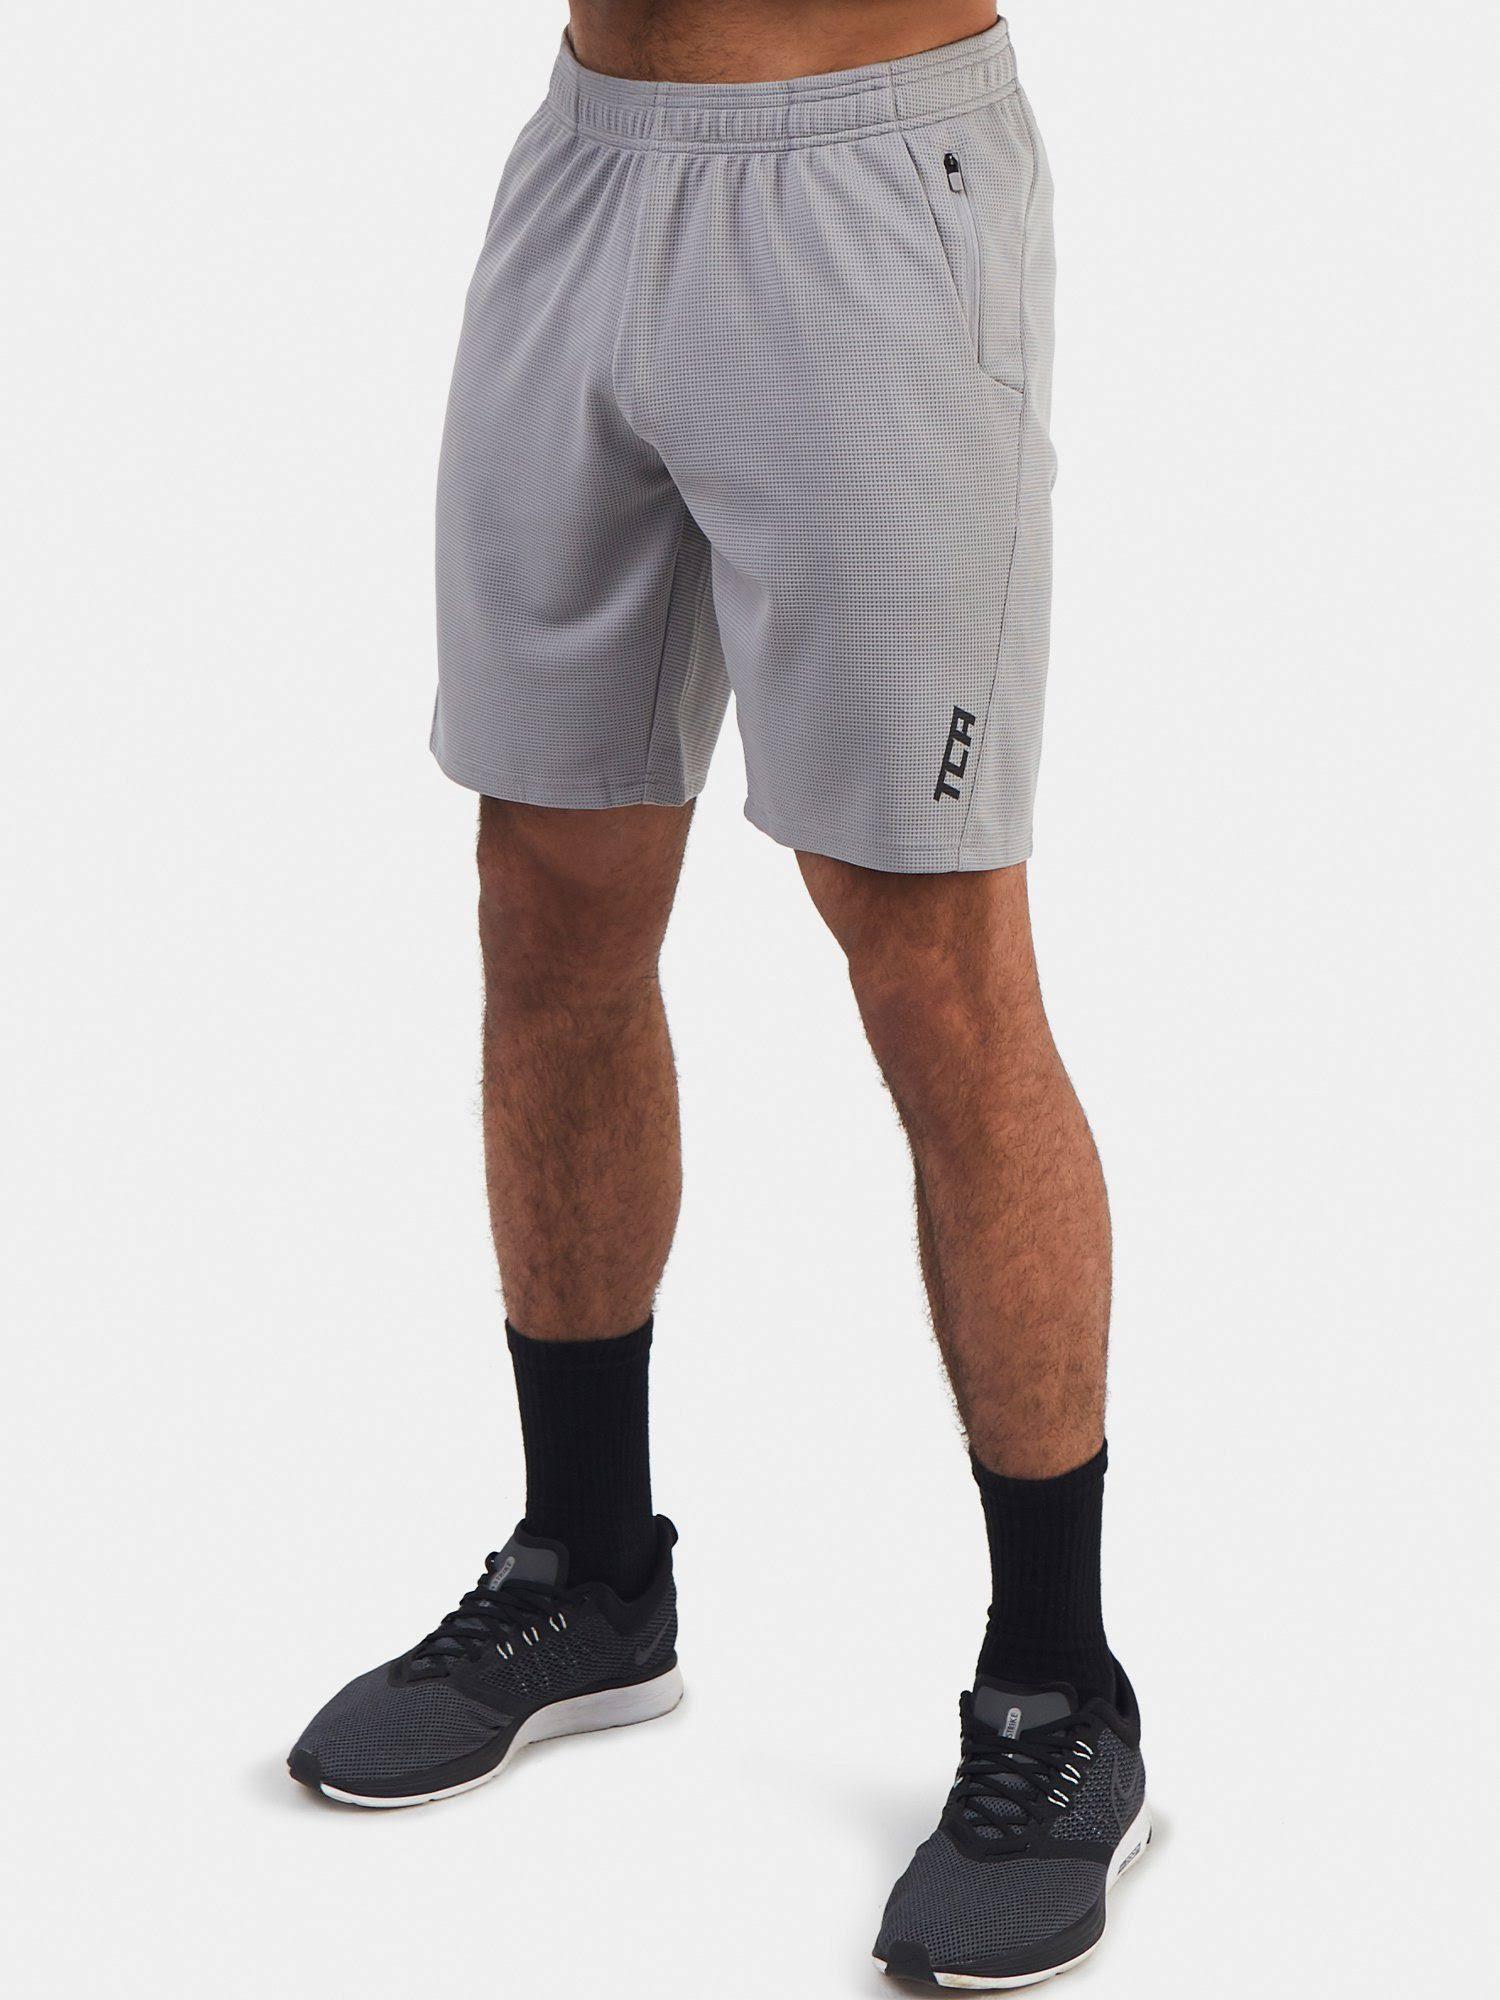 TCA Men's Aeron Gym Short with Zipped Pocket - Alloy Grey